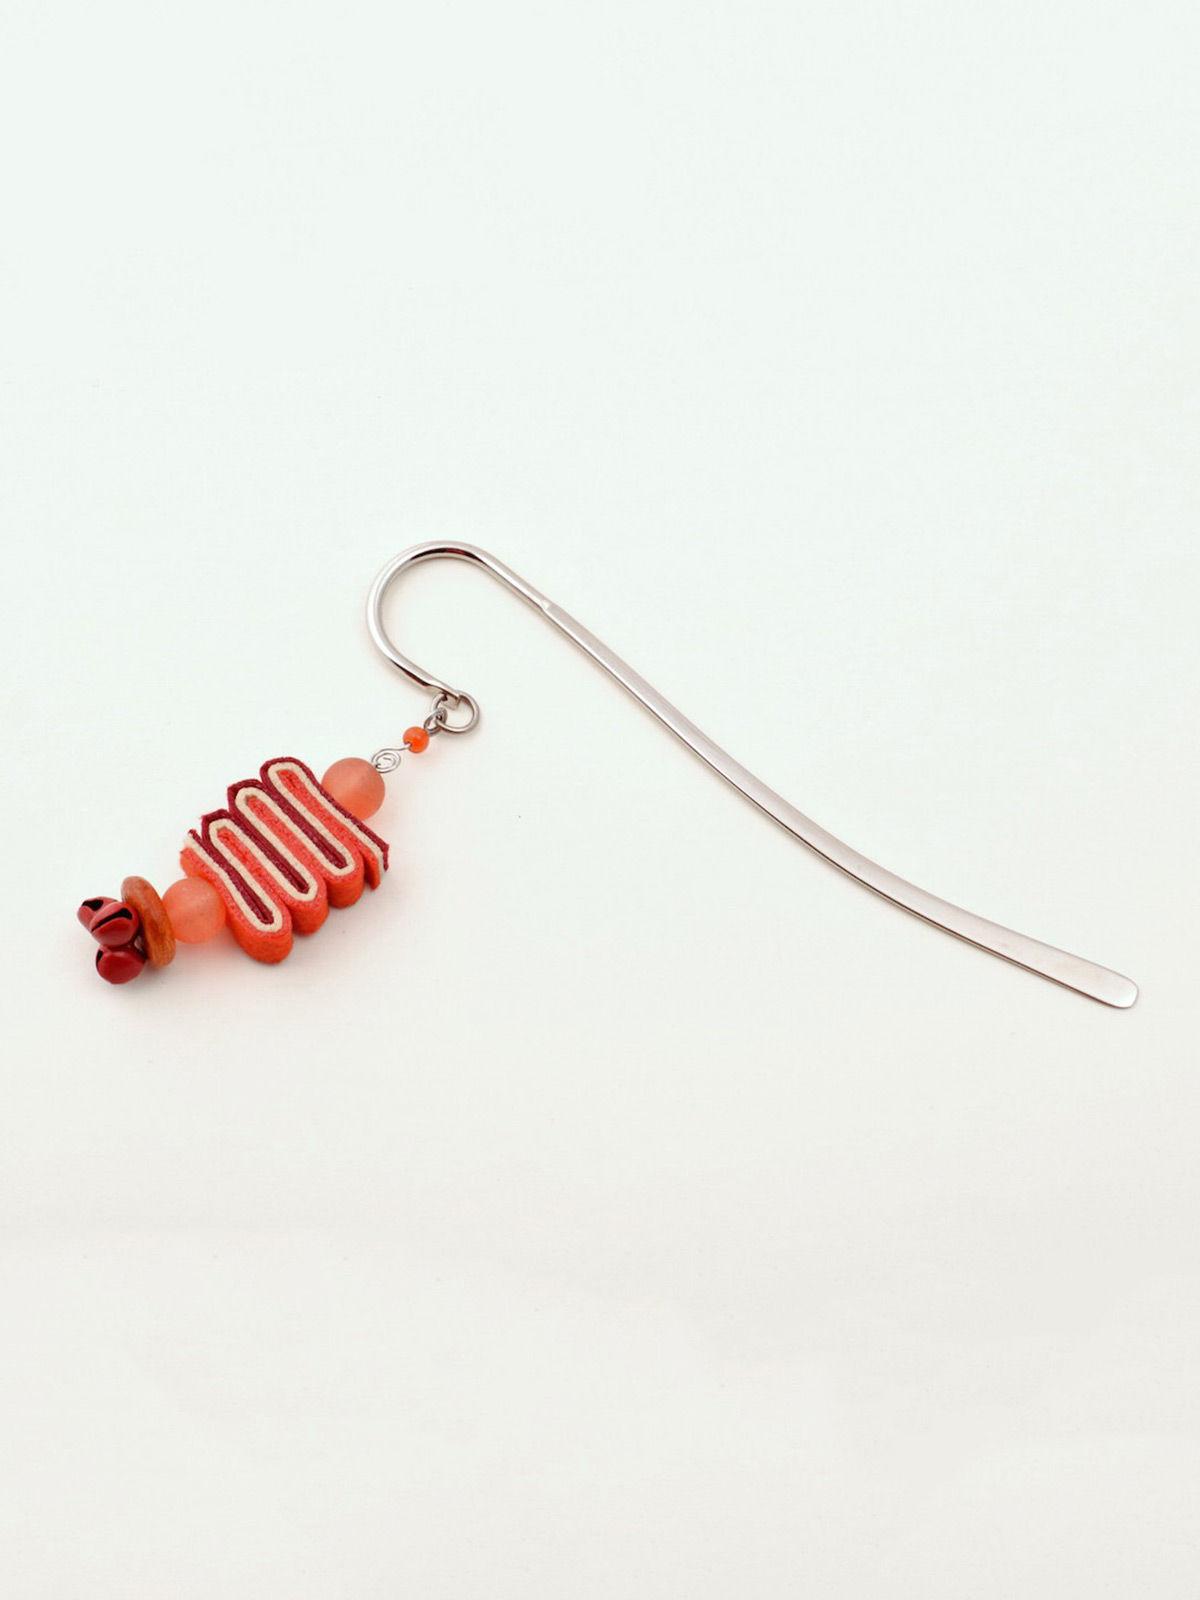 Bookworm Bookmark - Red